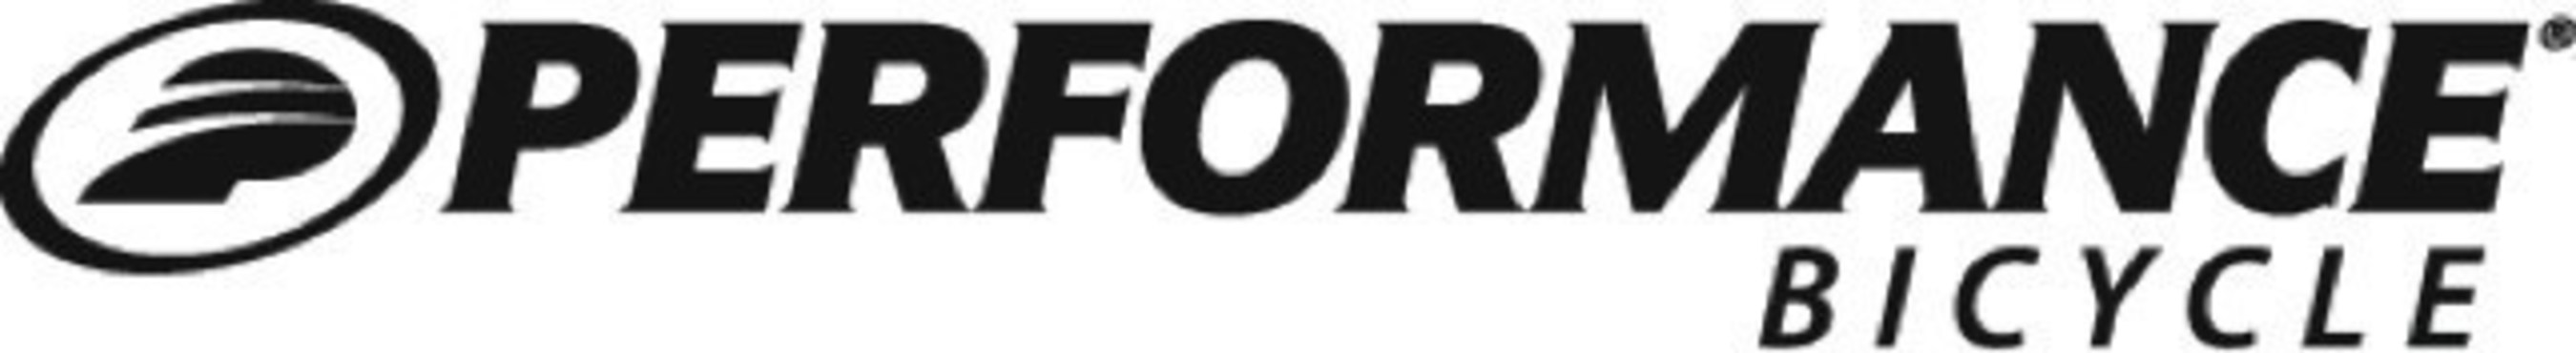 Image result for performance bike logo